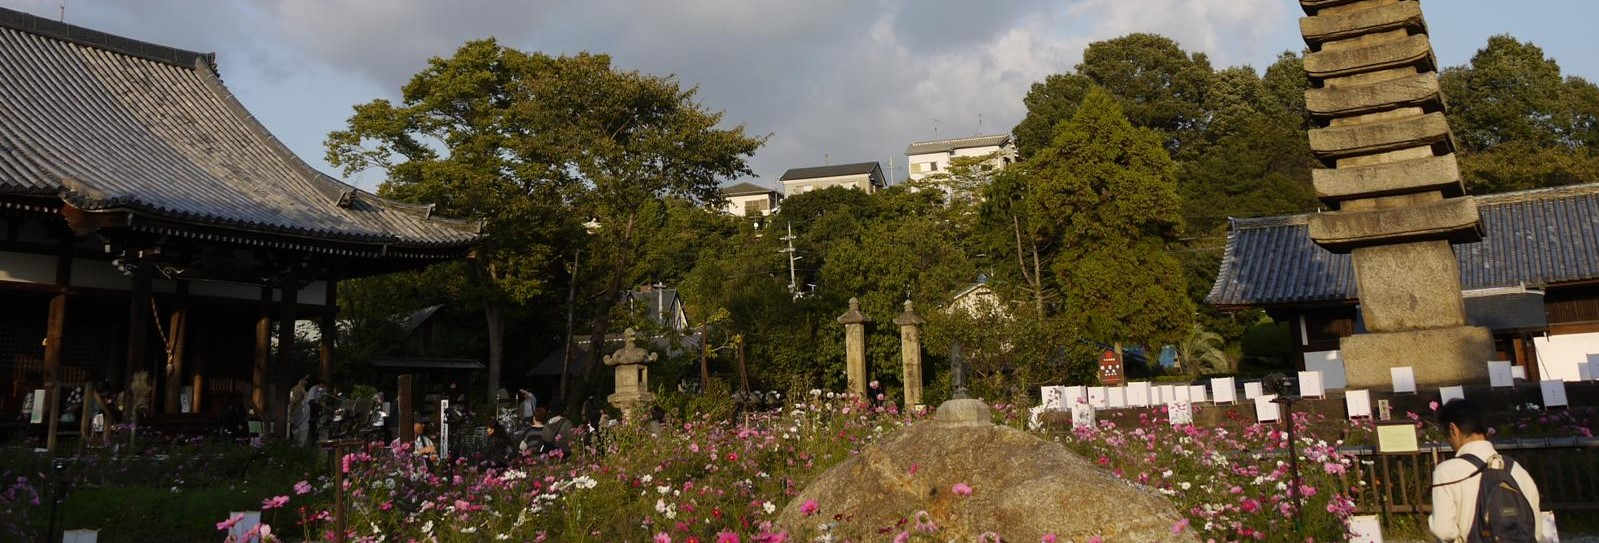 Hannya-ji Cosmos blossoms/般若寺大同花卉